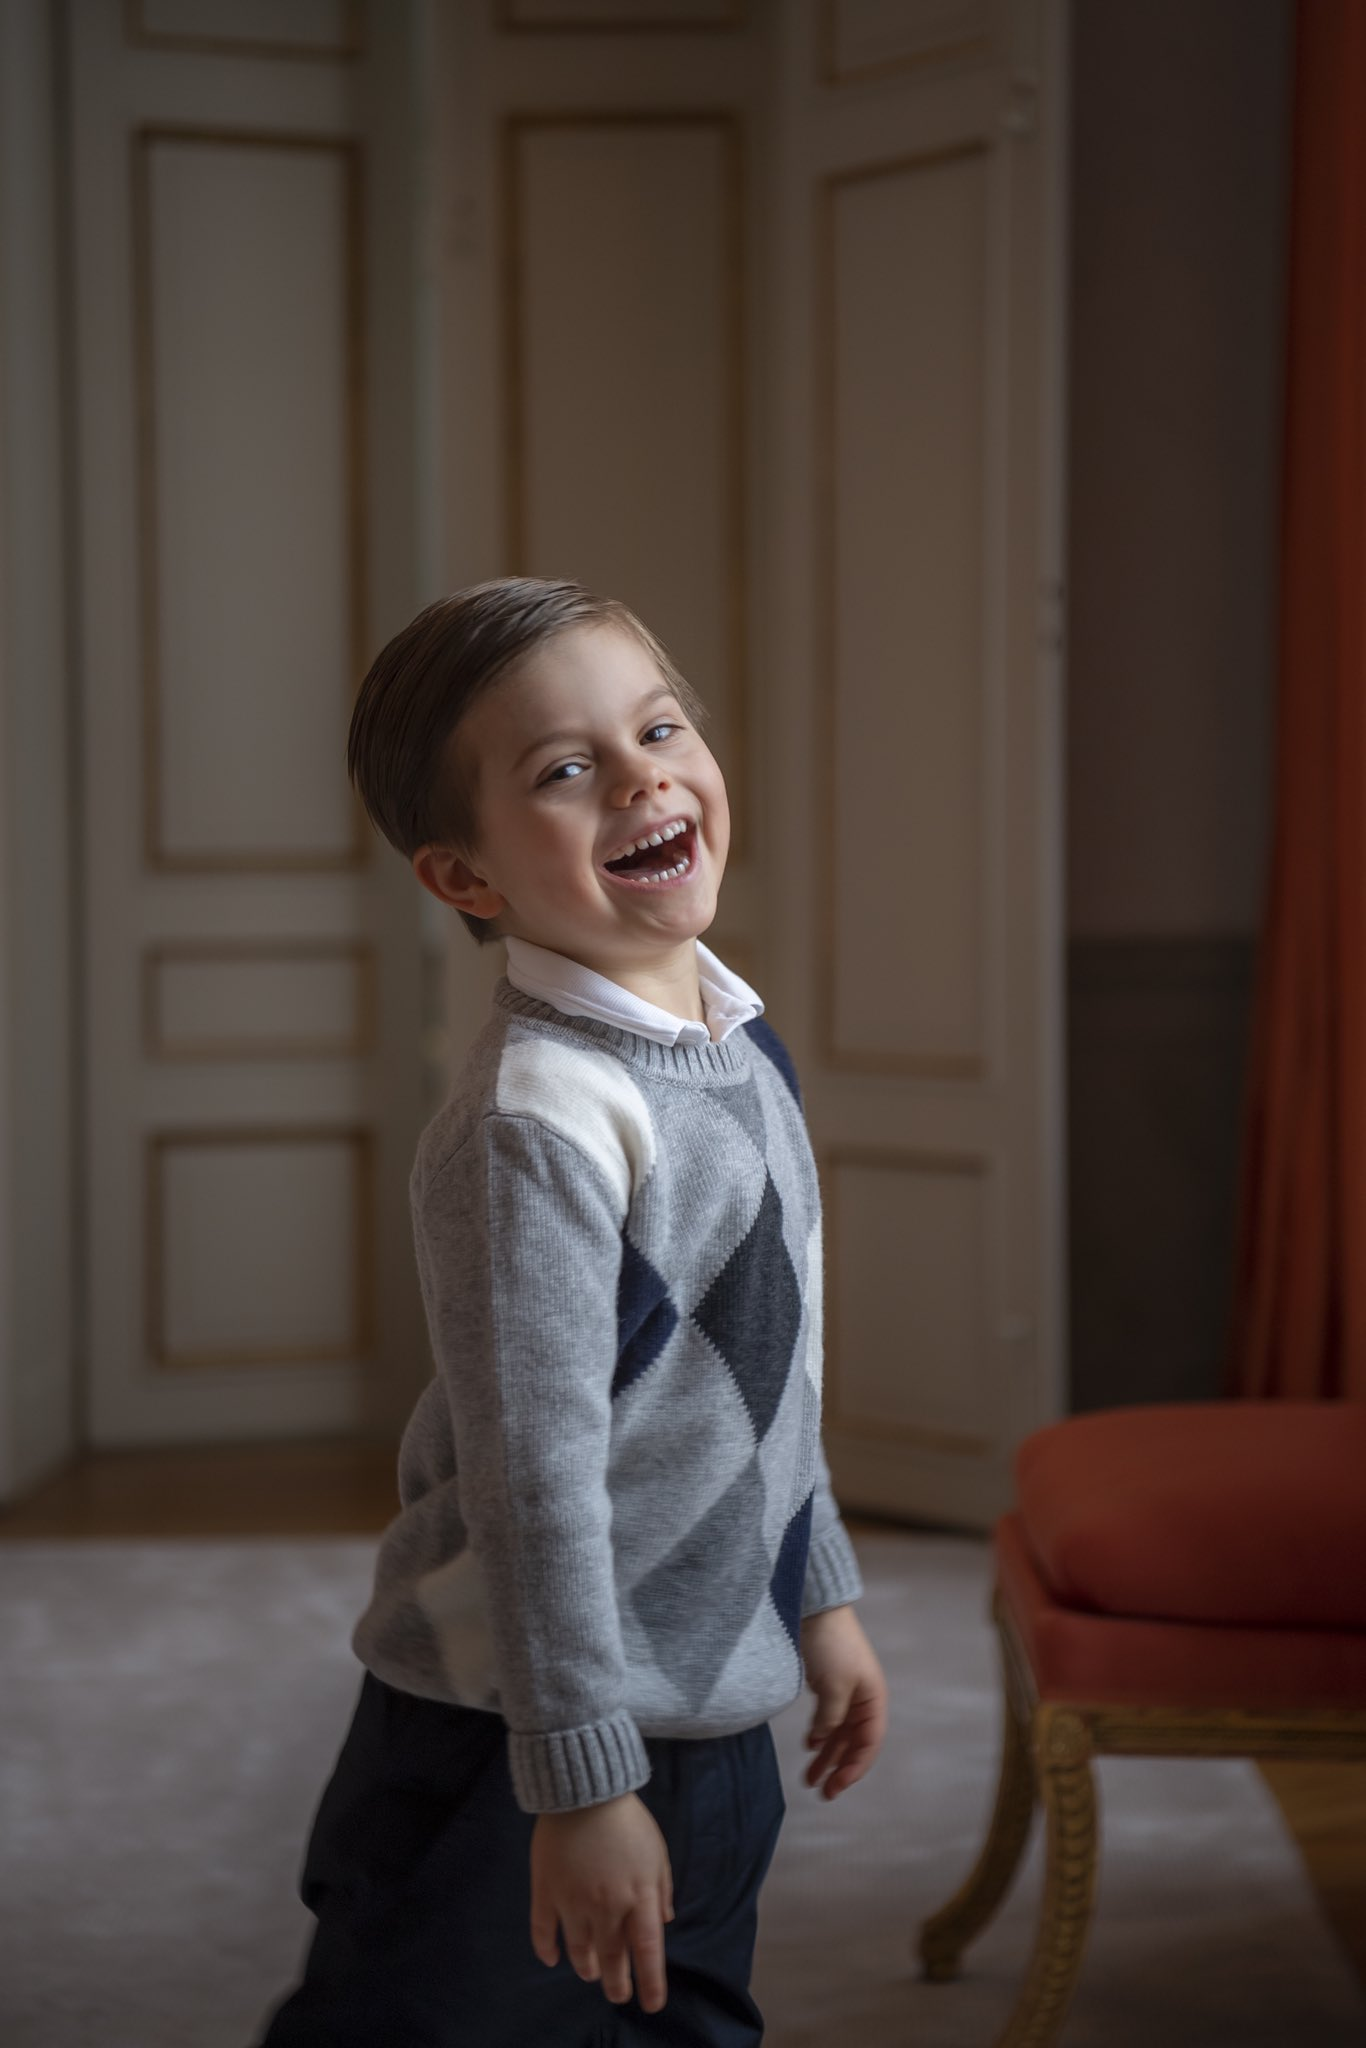 Swedish Prince Oscar is 5 today